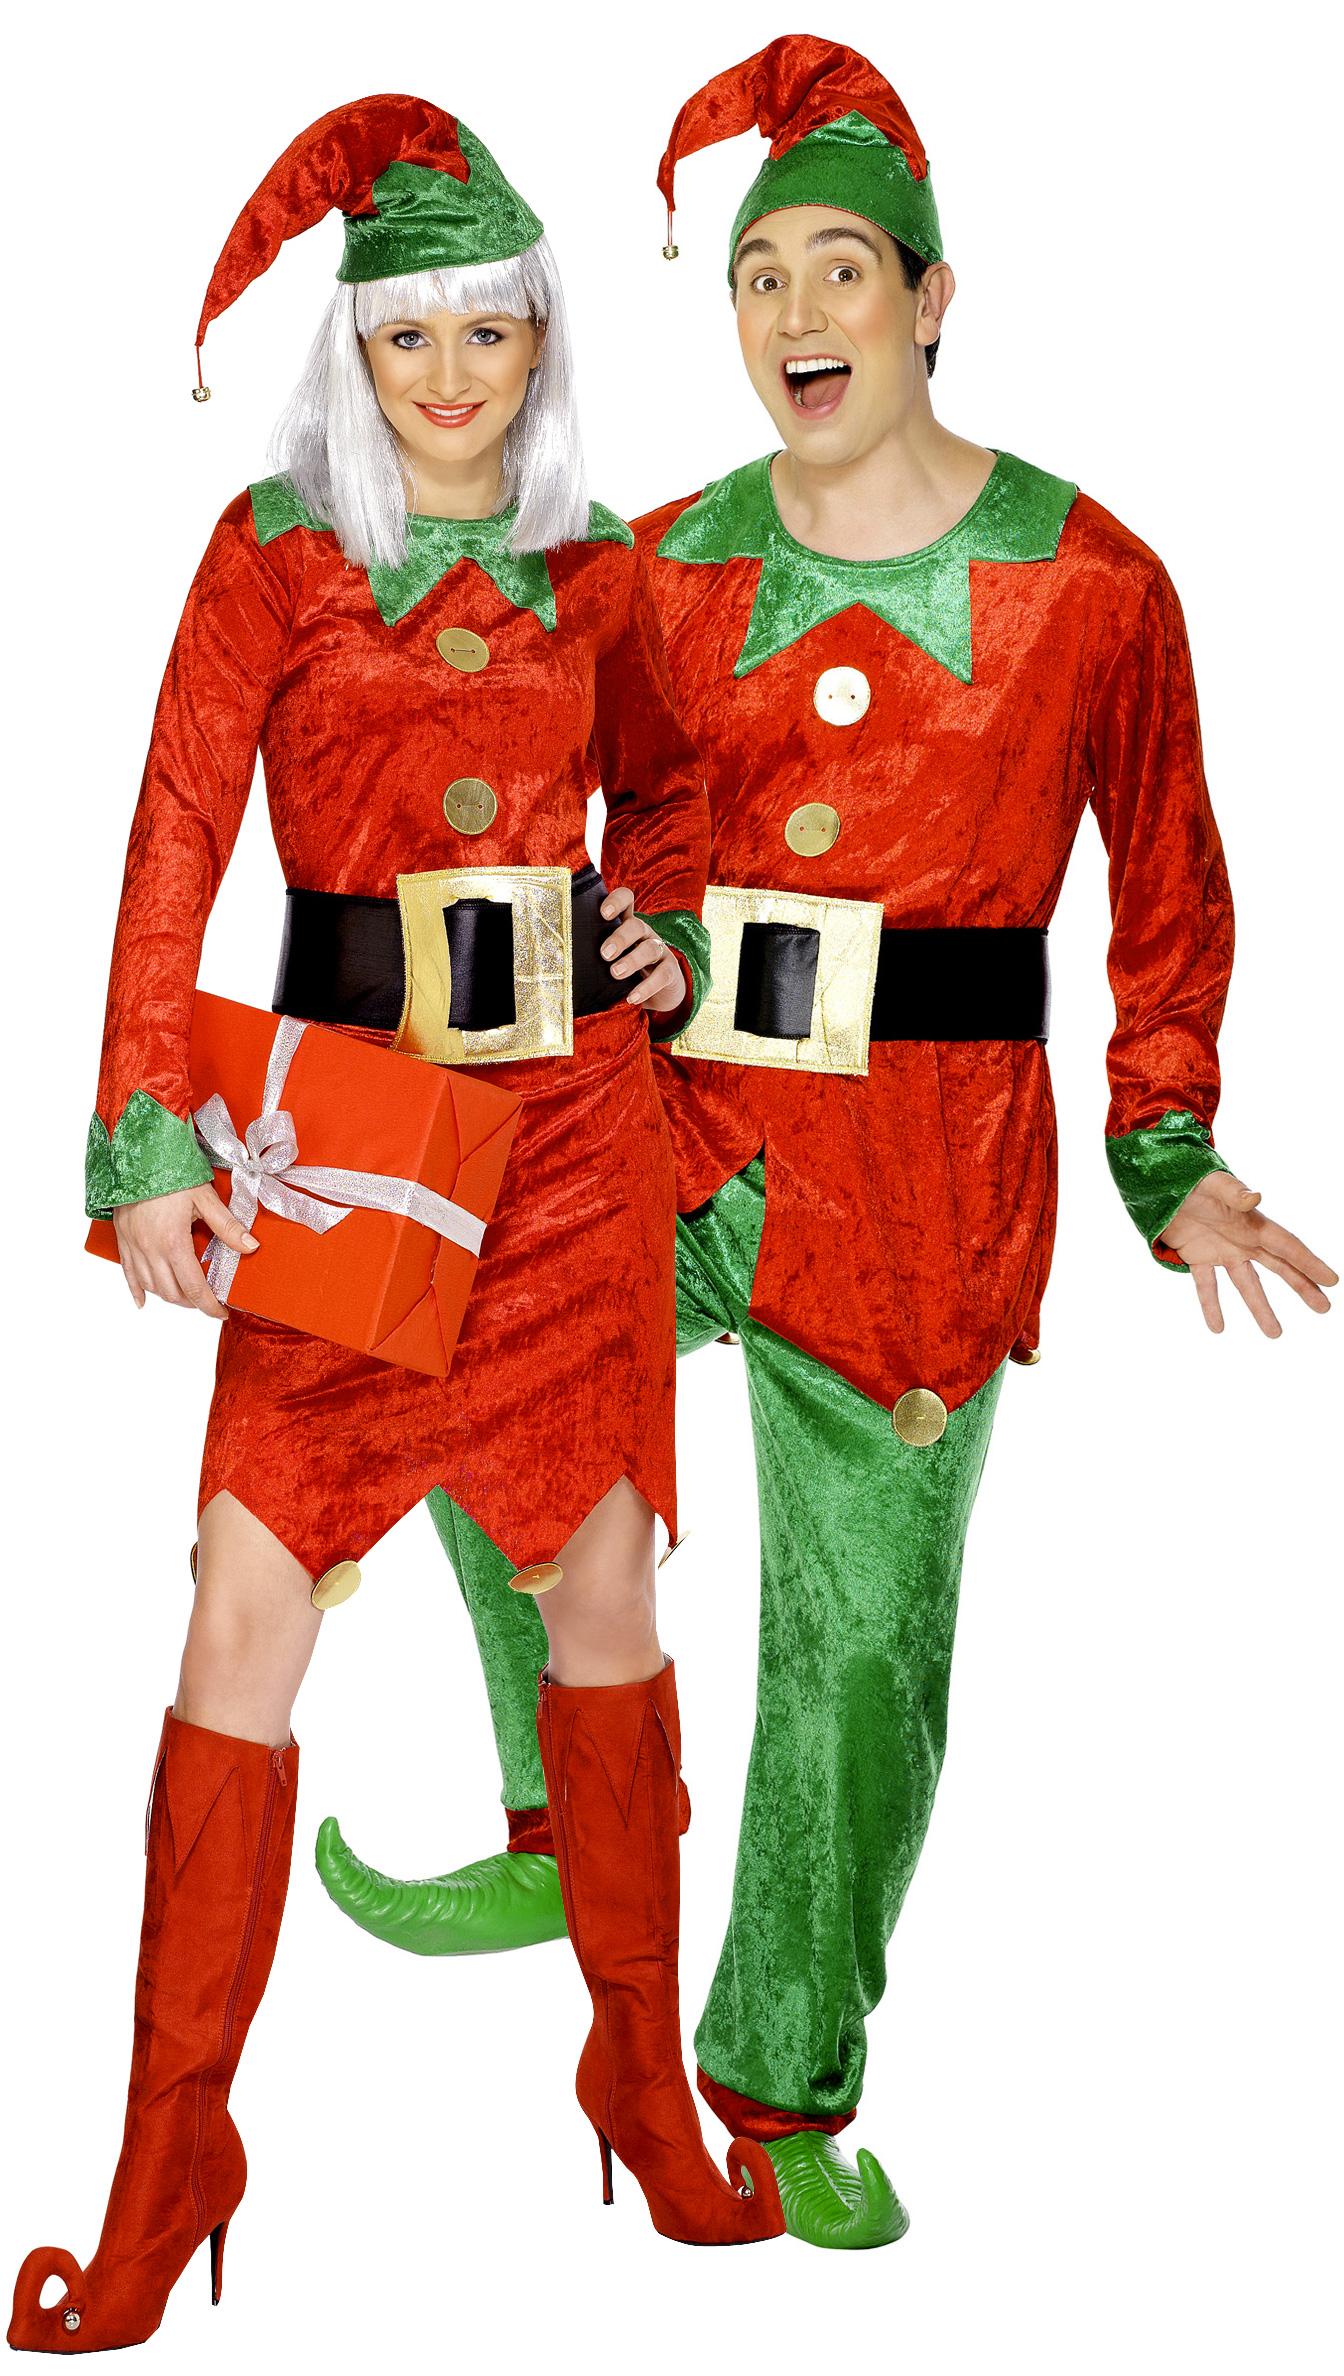 Christmas Elf costume for couple